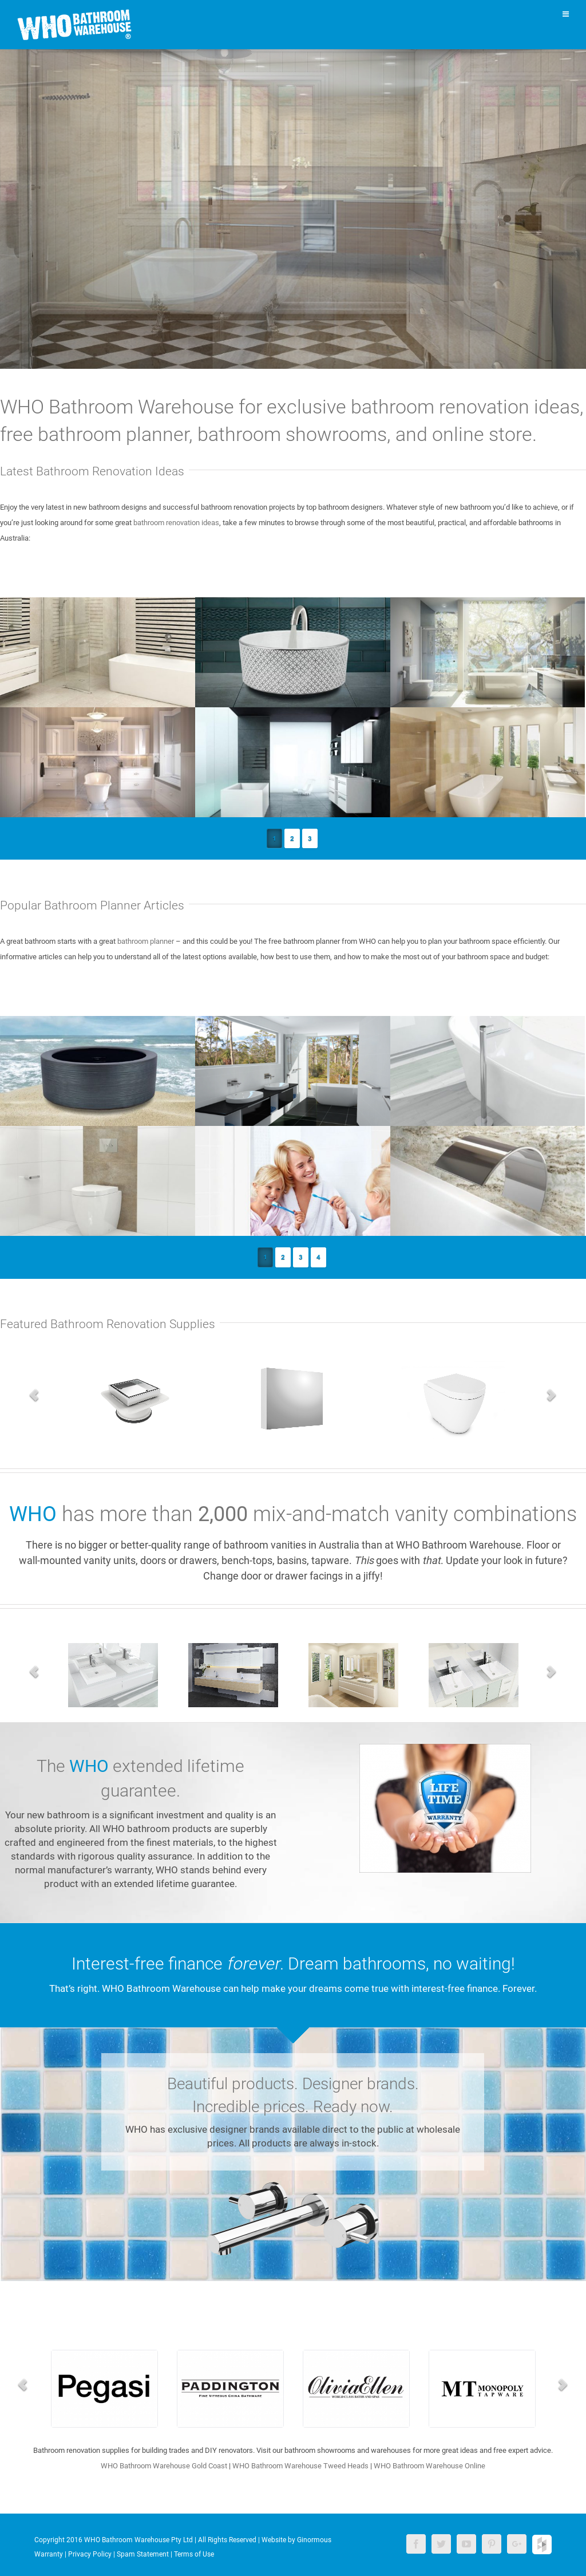 Who Bathroom Warehouse Compeors